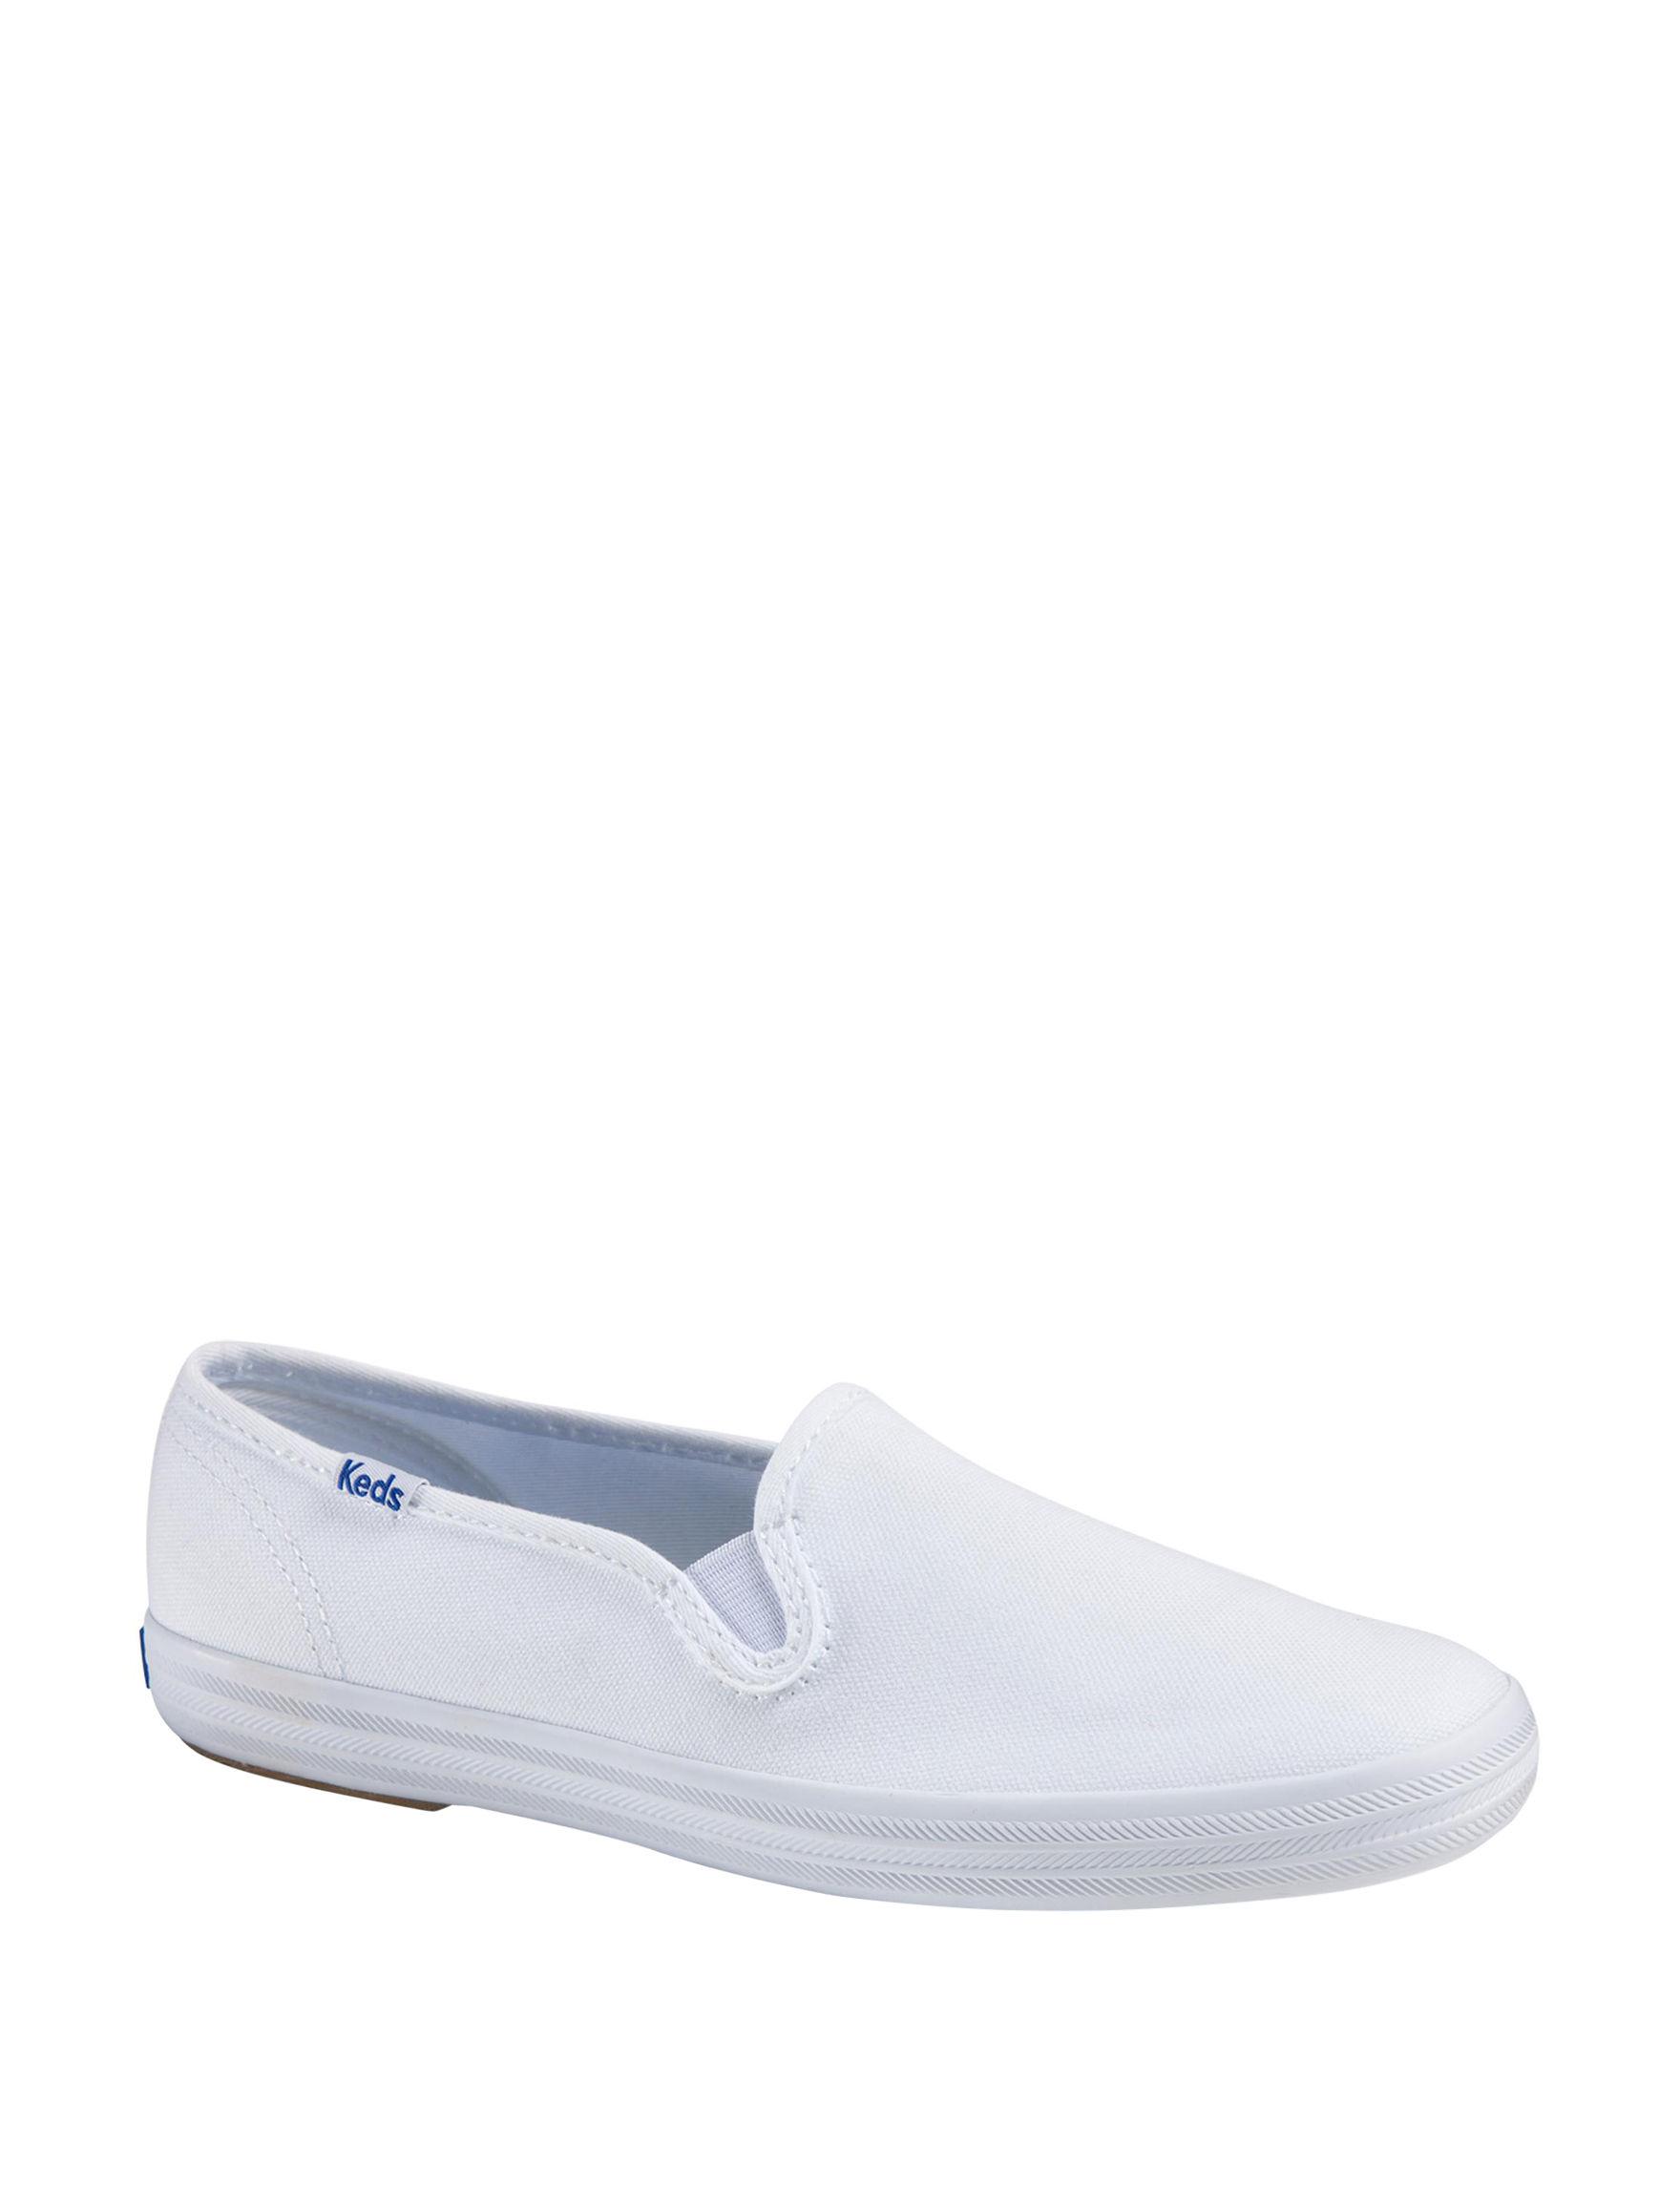 Keds White Comfort